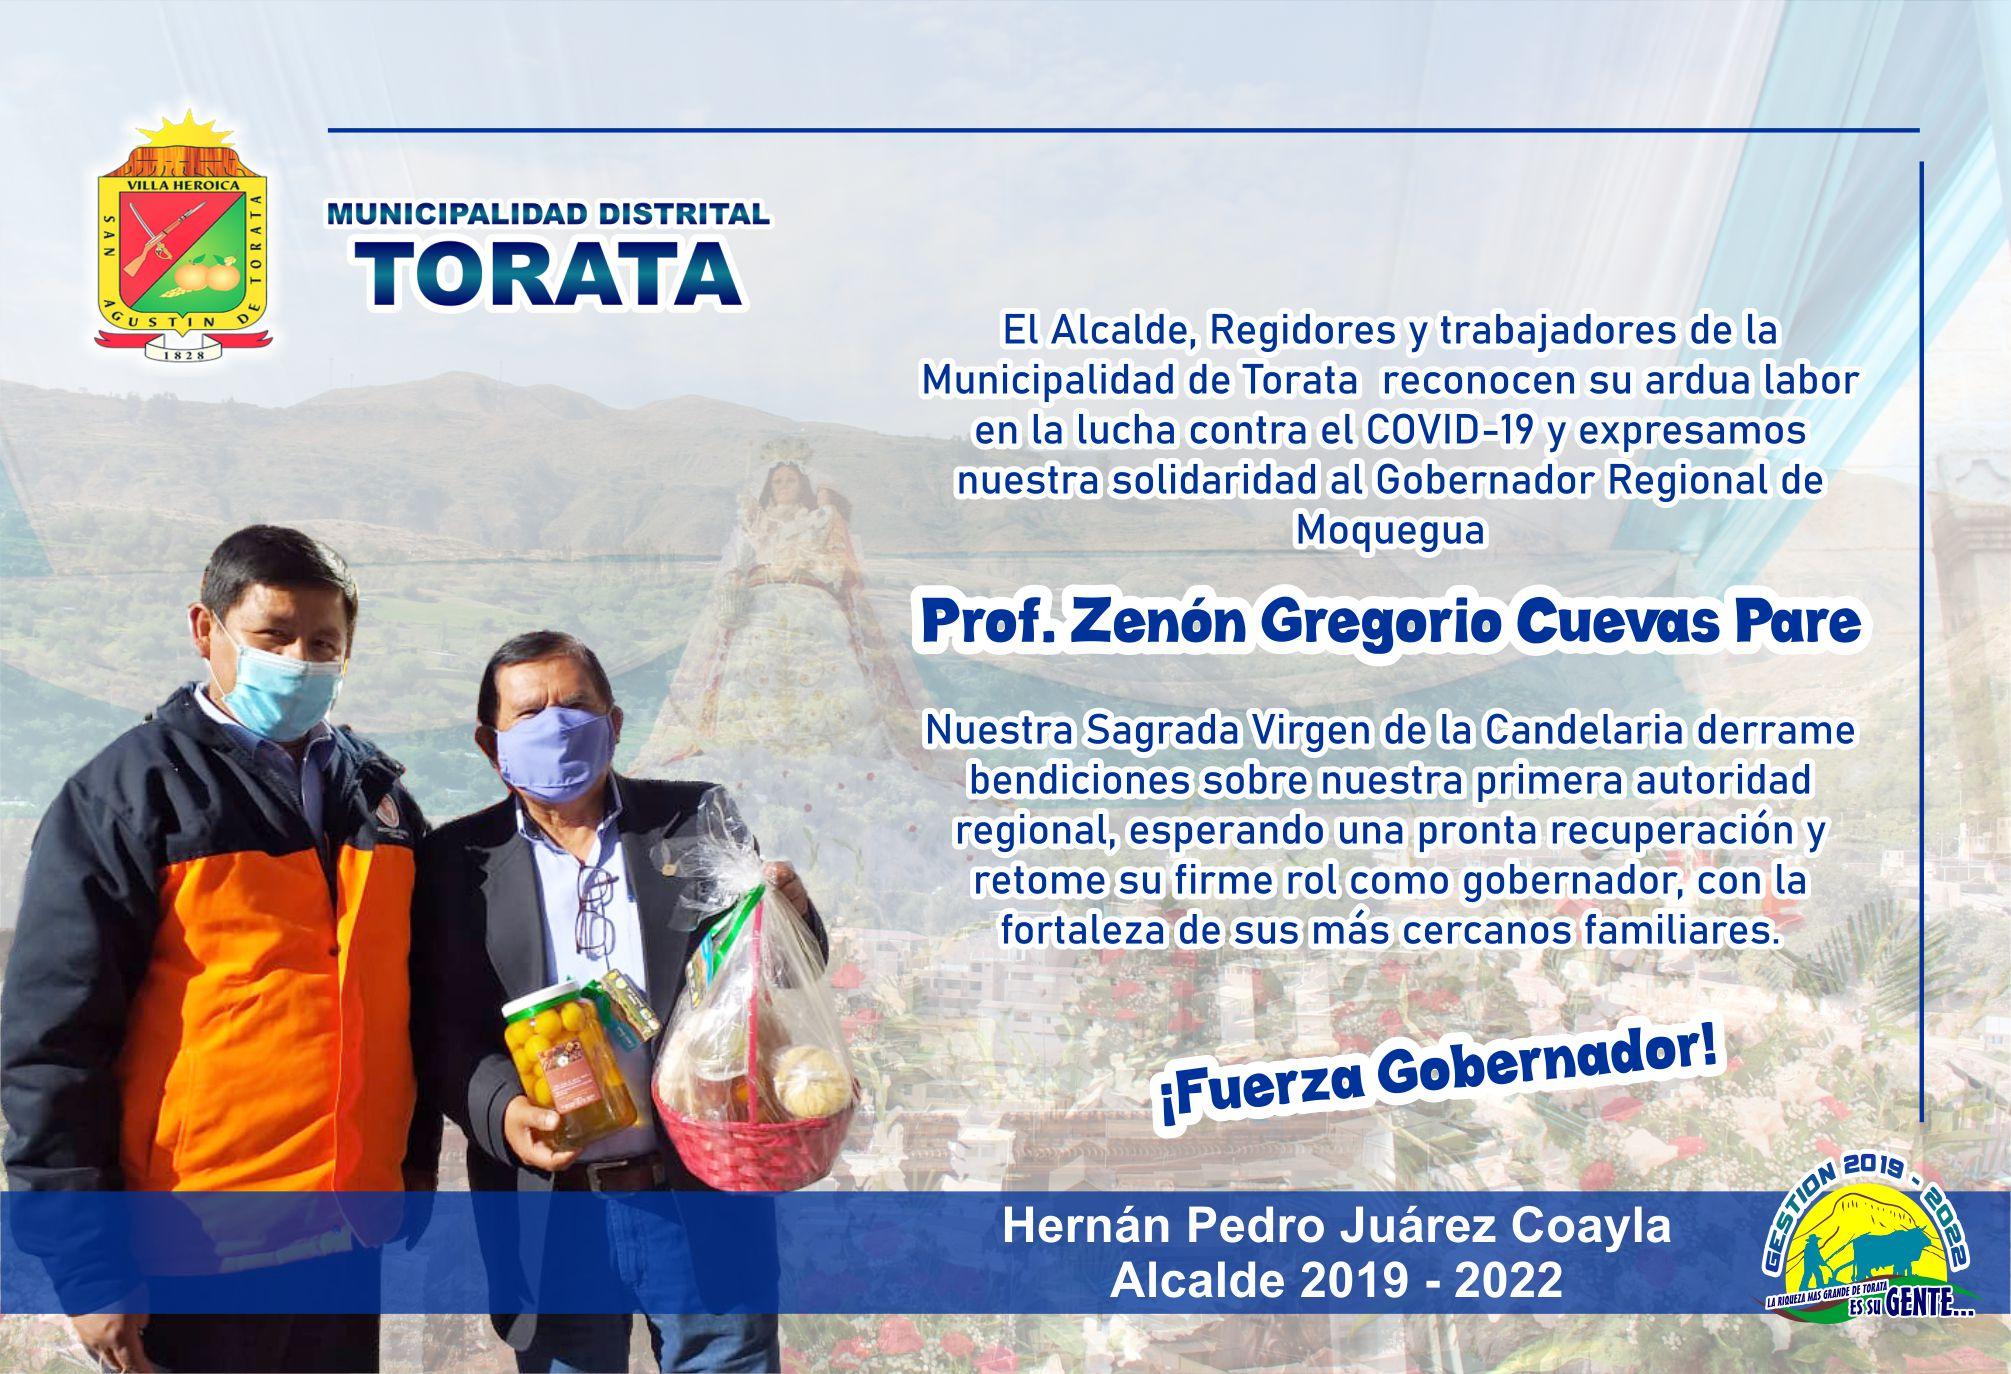 DESDE TORATA EXPRESAMOS UNA PRONTA RECUPERACION A NUESTRO GOBERNADOR REGIONAL DE MOQUEGUA